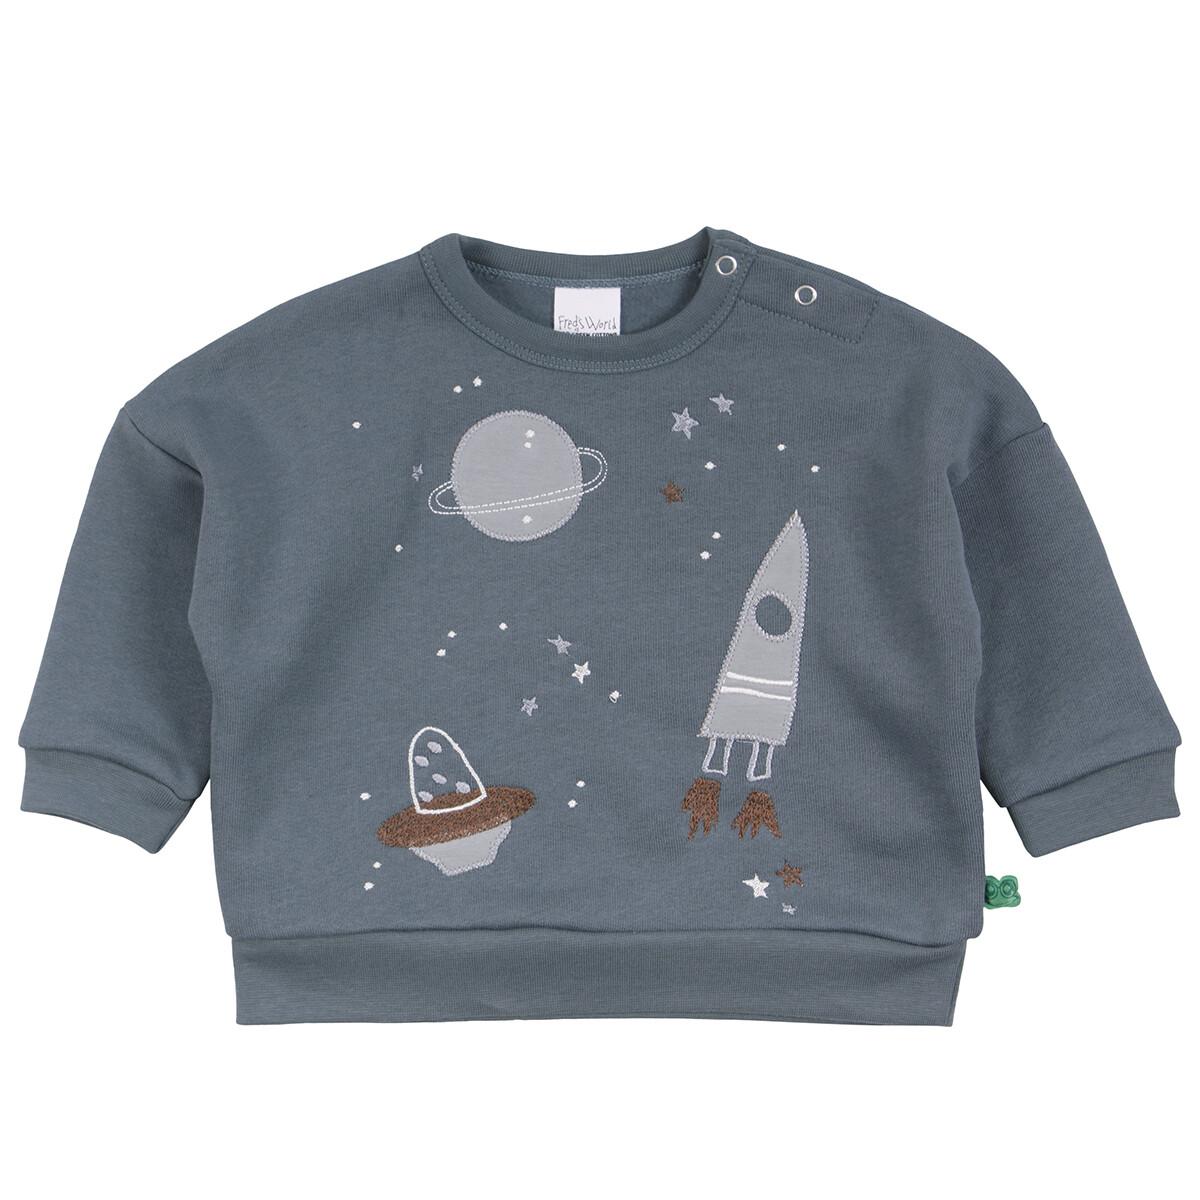 Fred's World Baby Boy Astro Sweatshirt